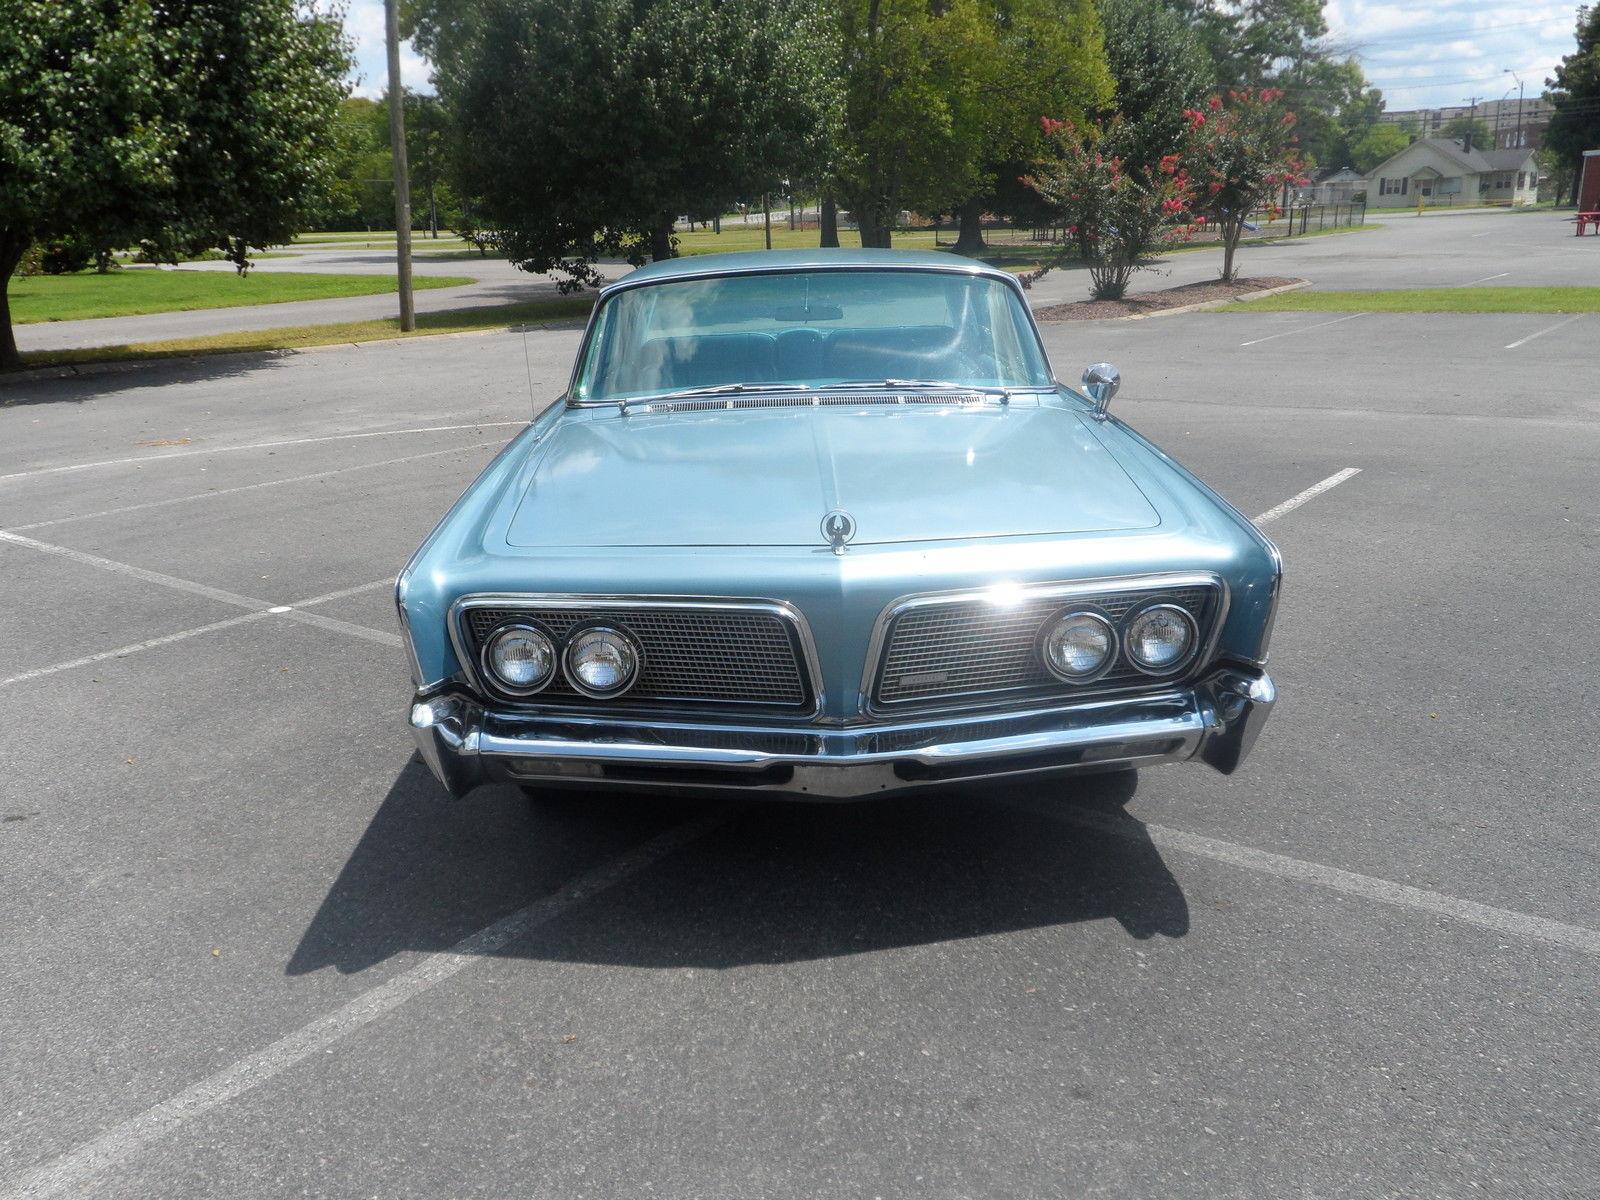 1964 chrysler imperial crown-11